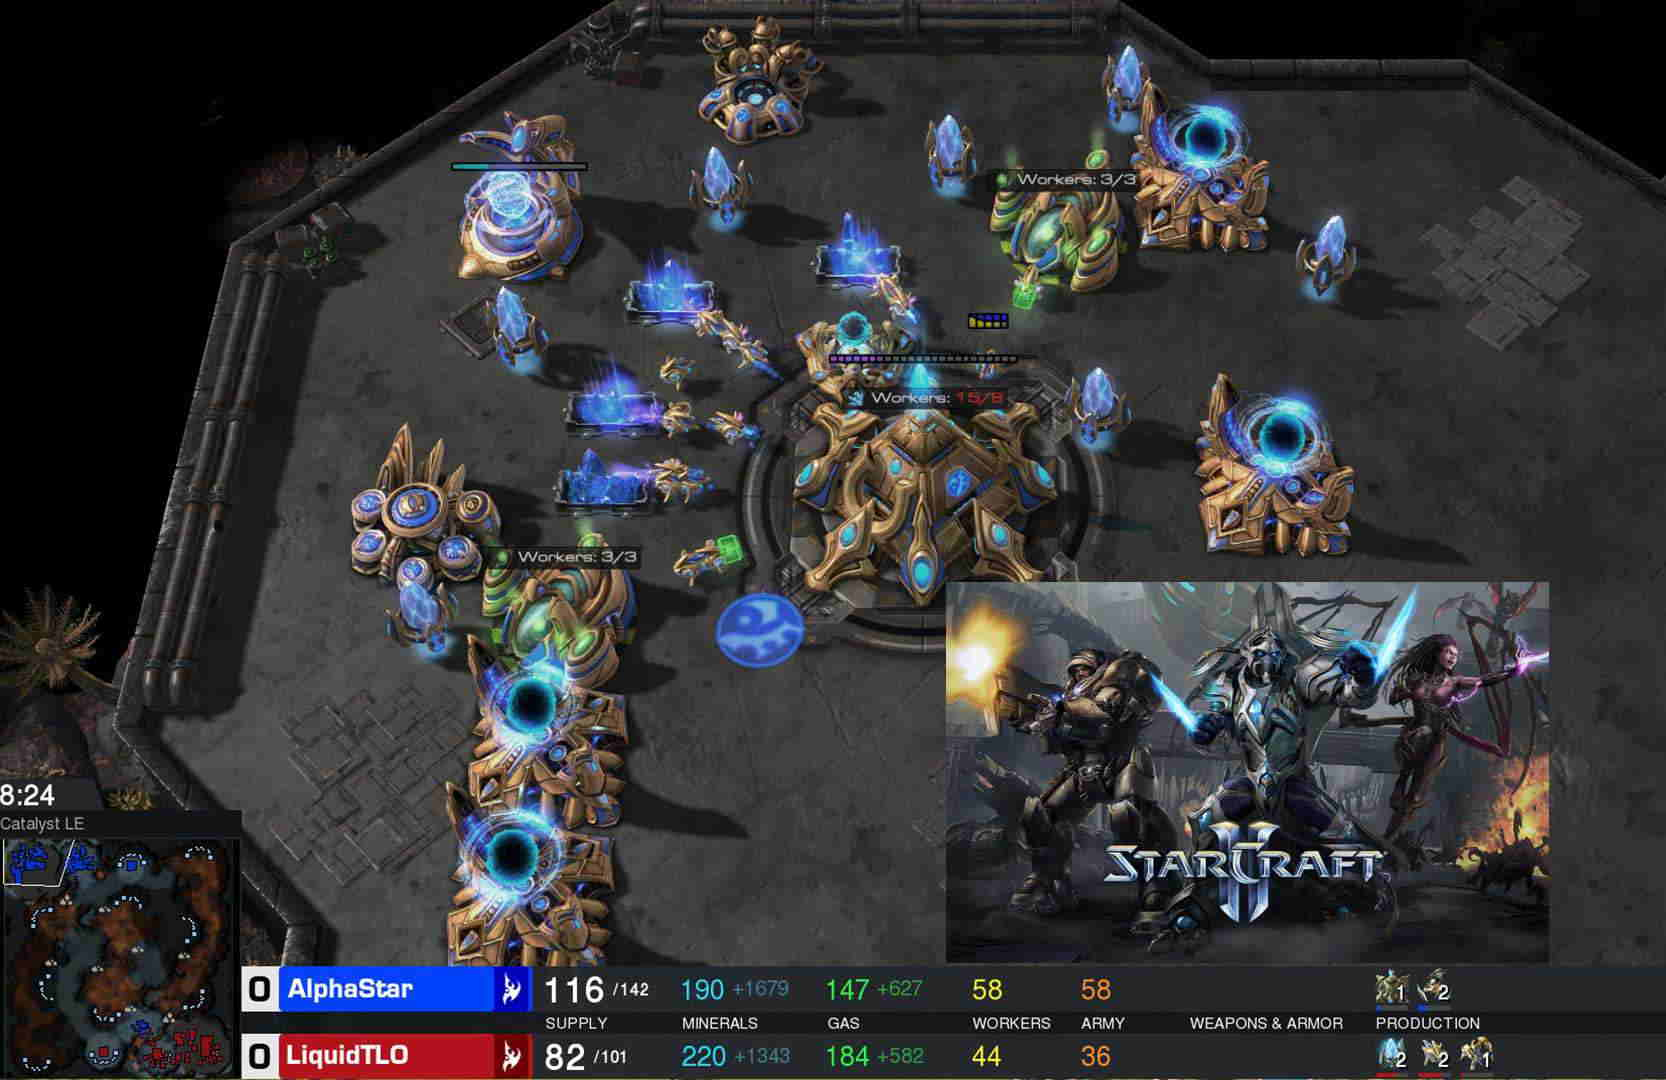 starcraft-2-1554899262.jpg